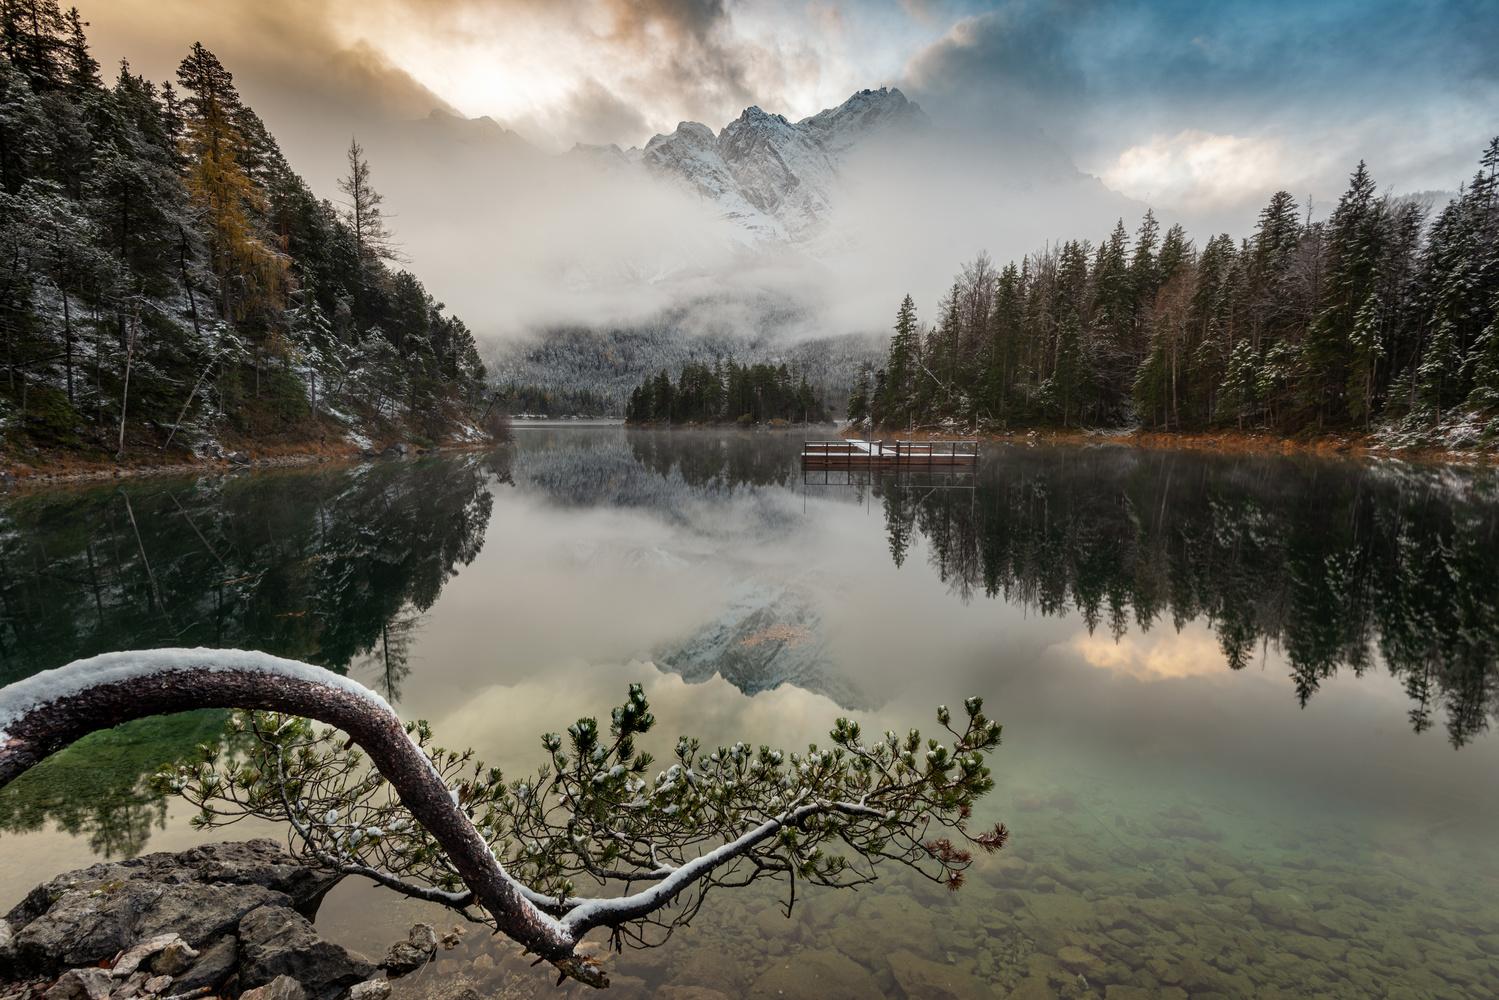 Head in Clouds by Michael Bottari